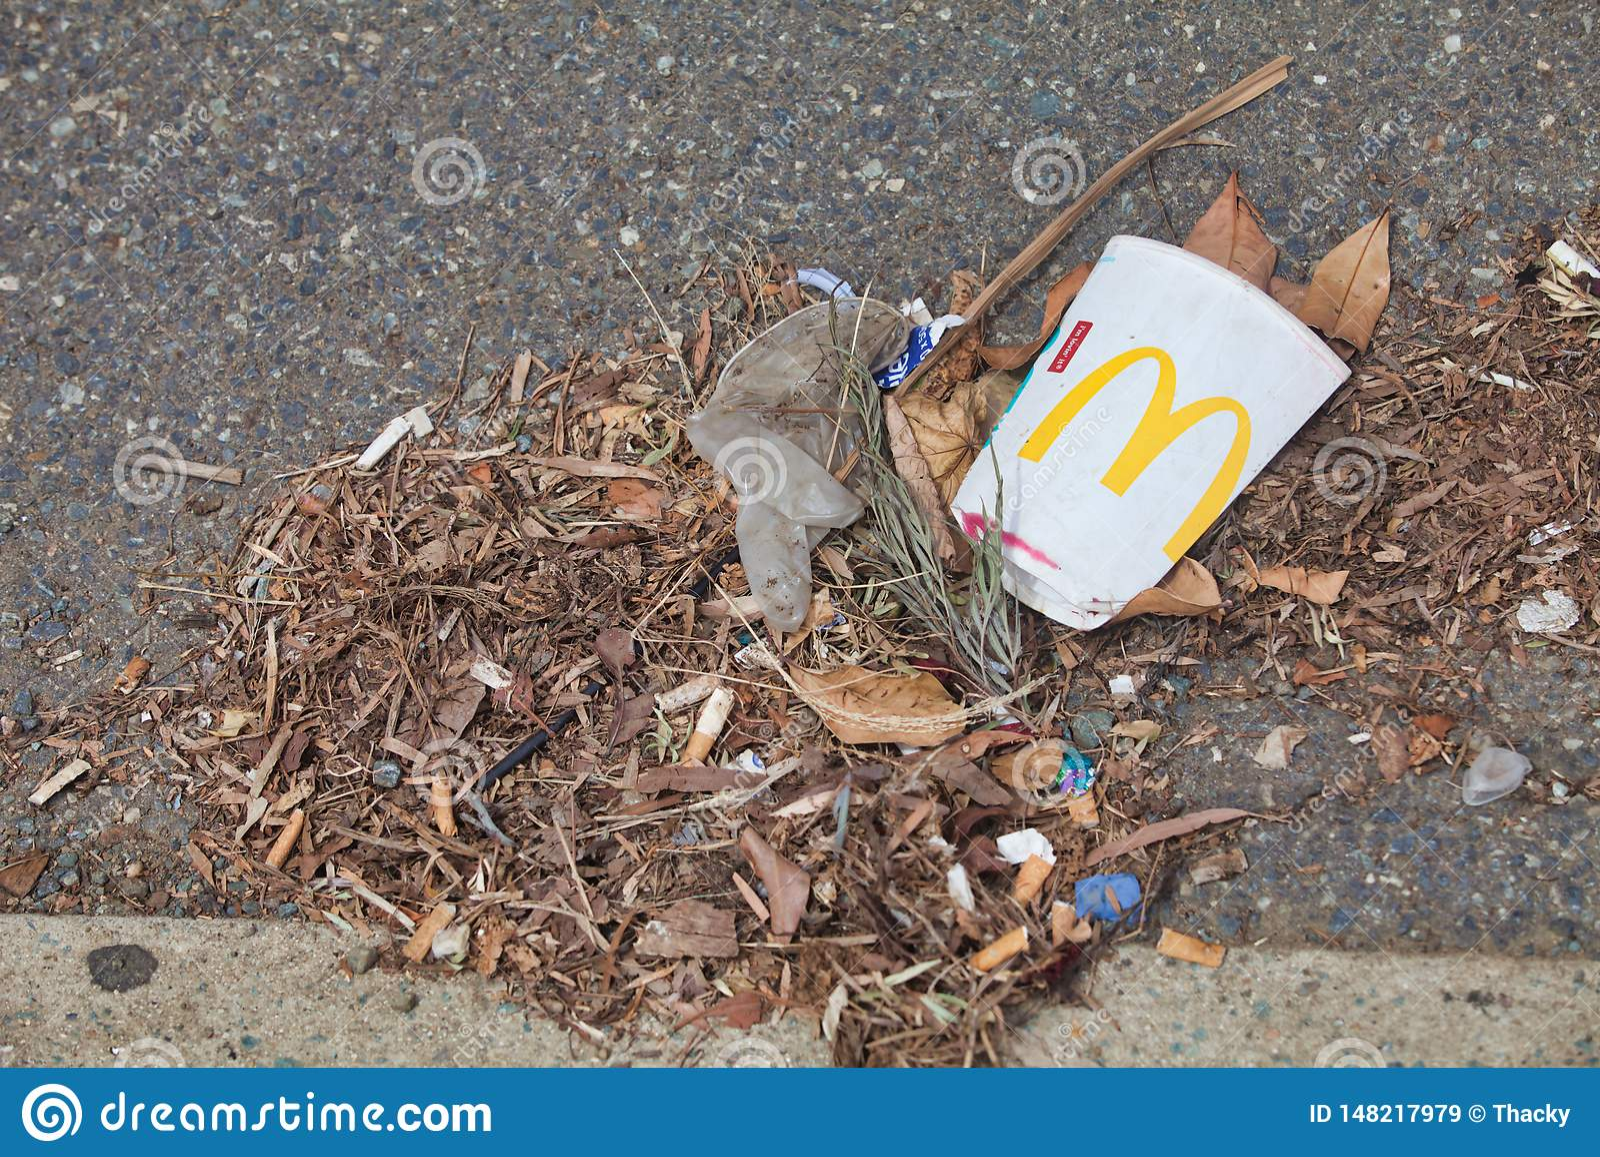 McDonalds空的杯子和废弃物由路的边离开